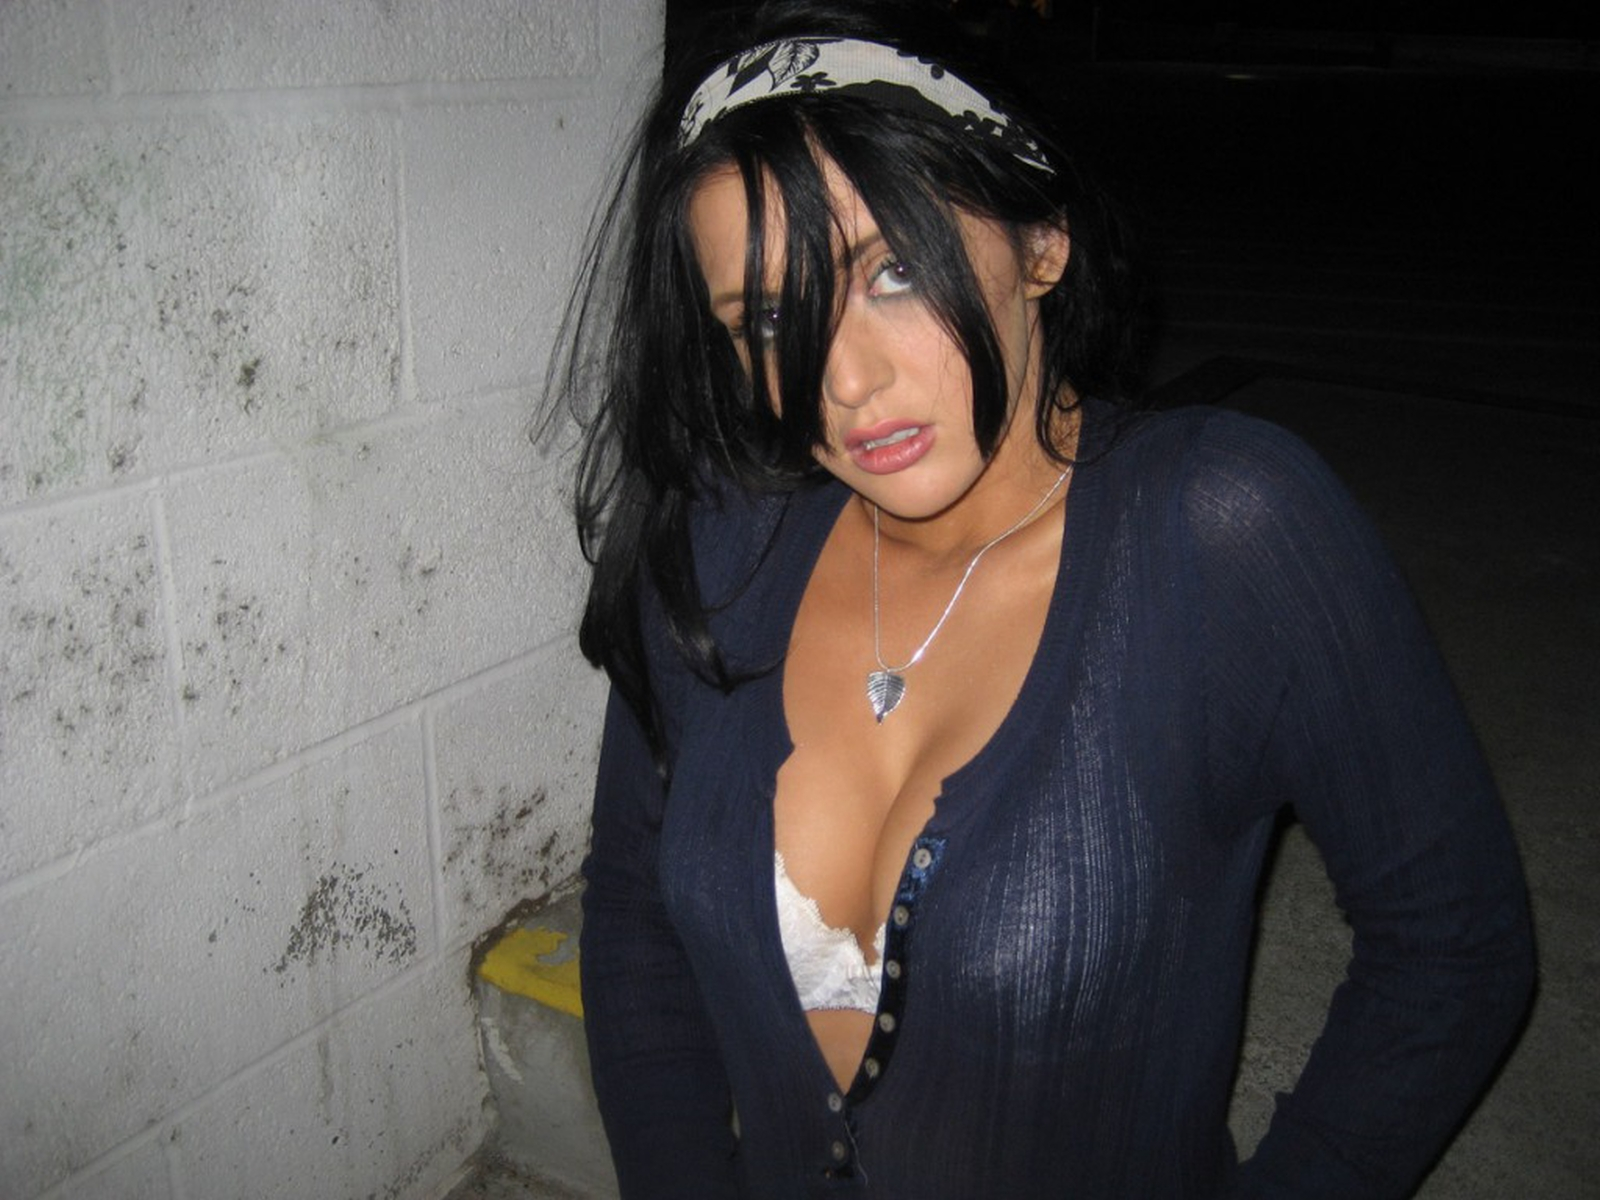 veronica-ricci-nude-flash-in-public-night-car-park-25